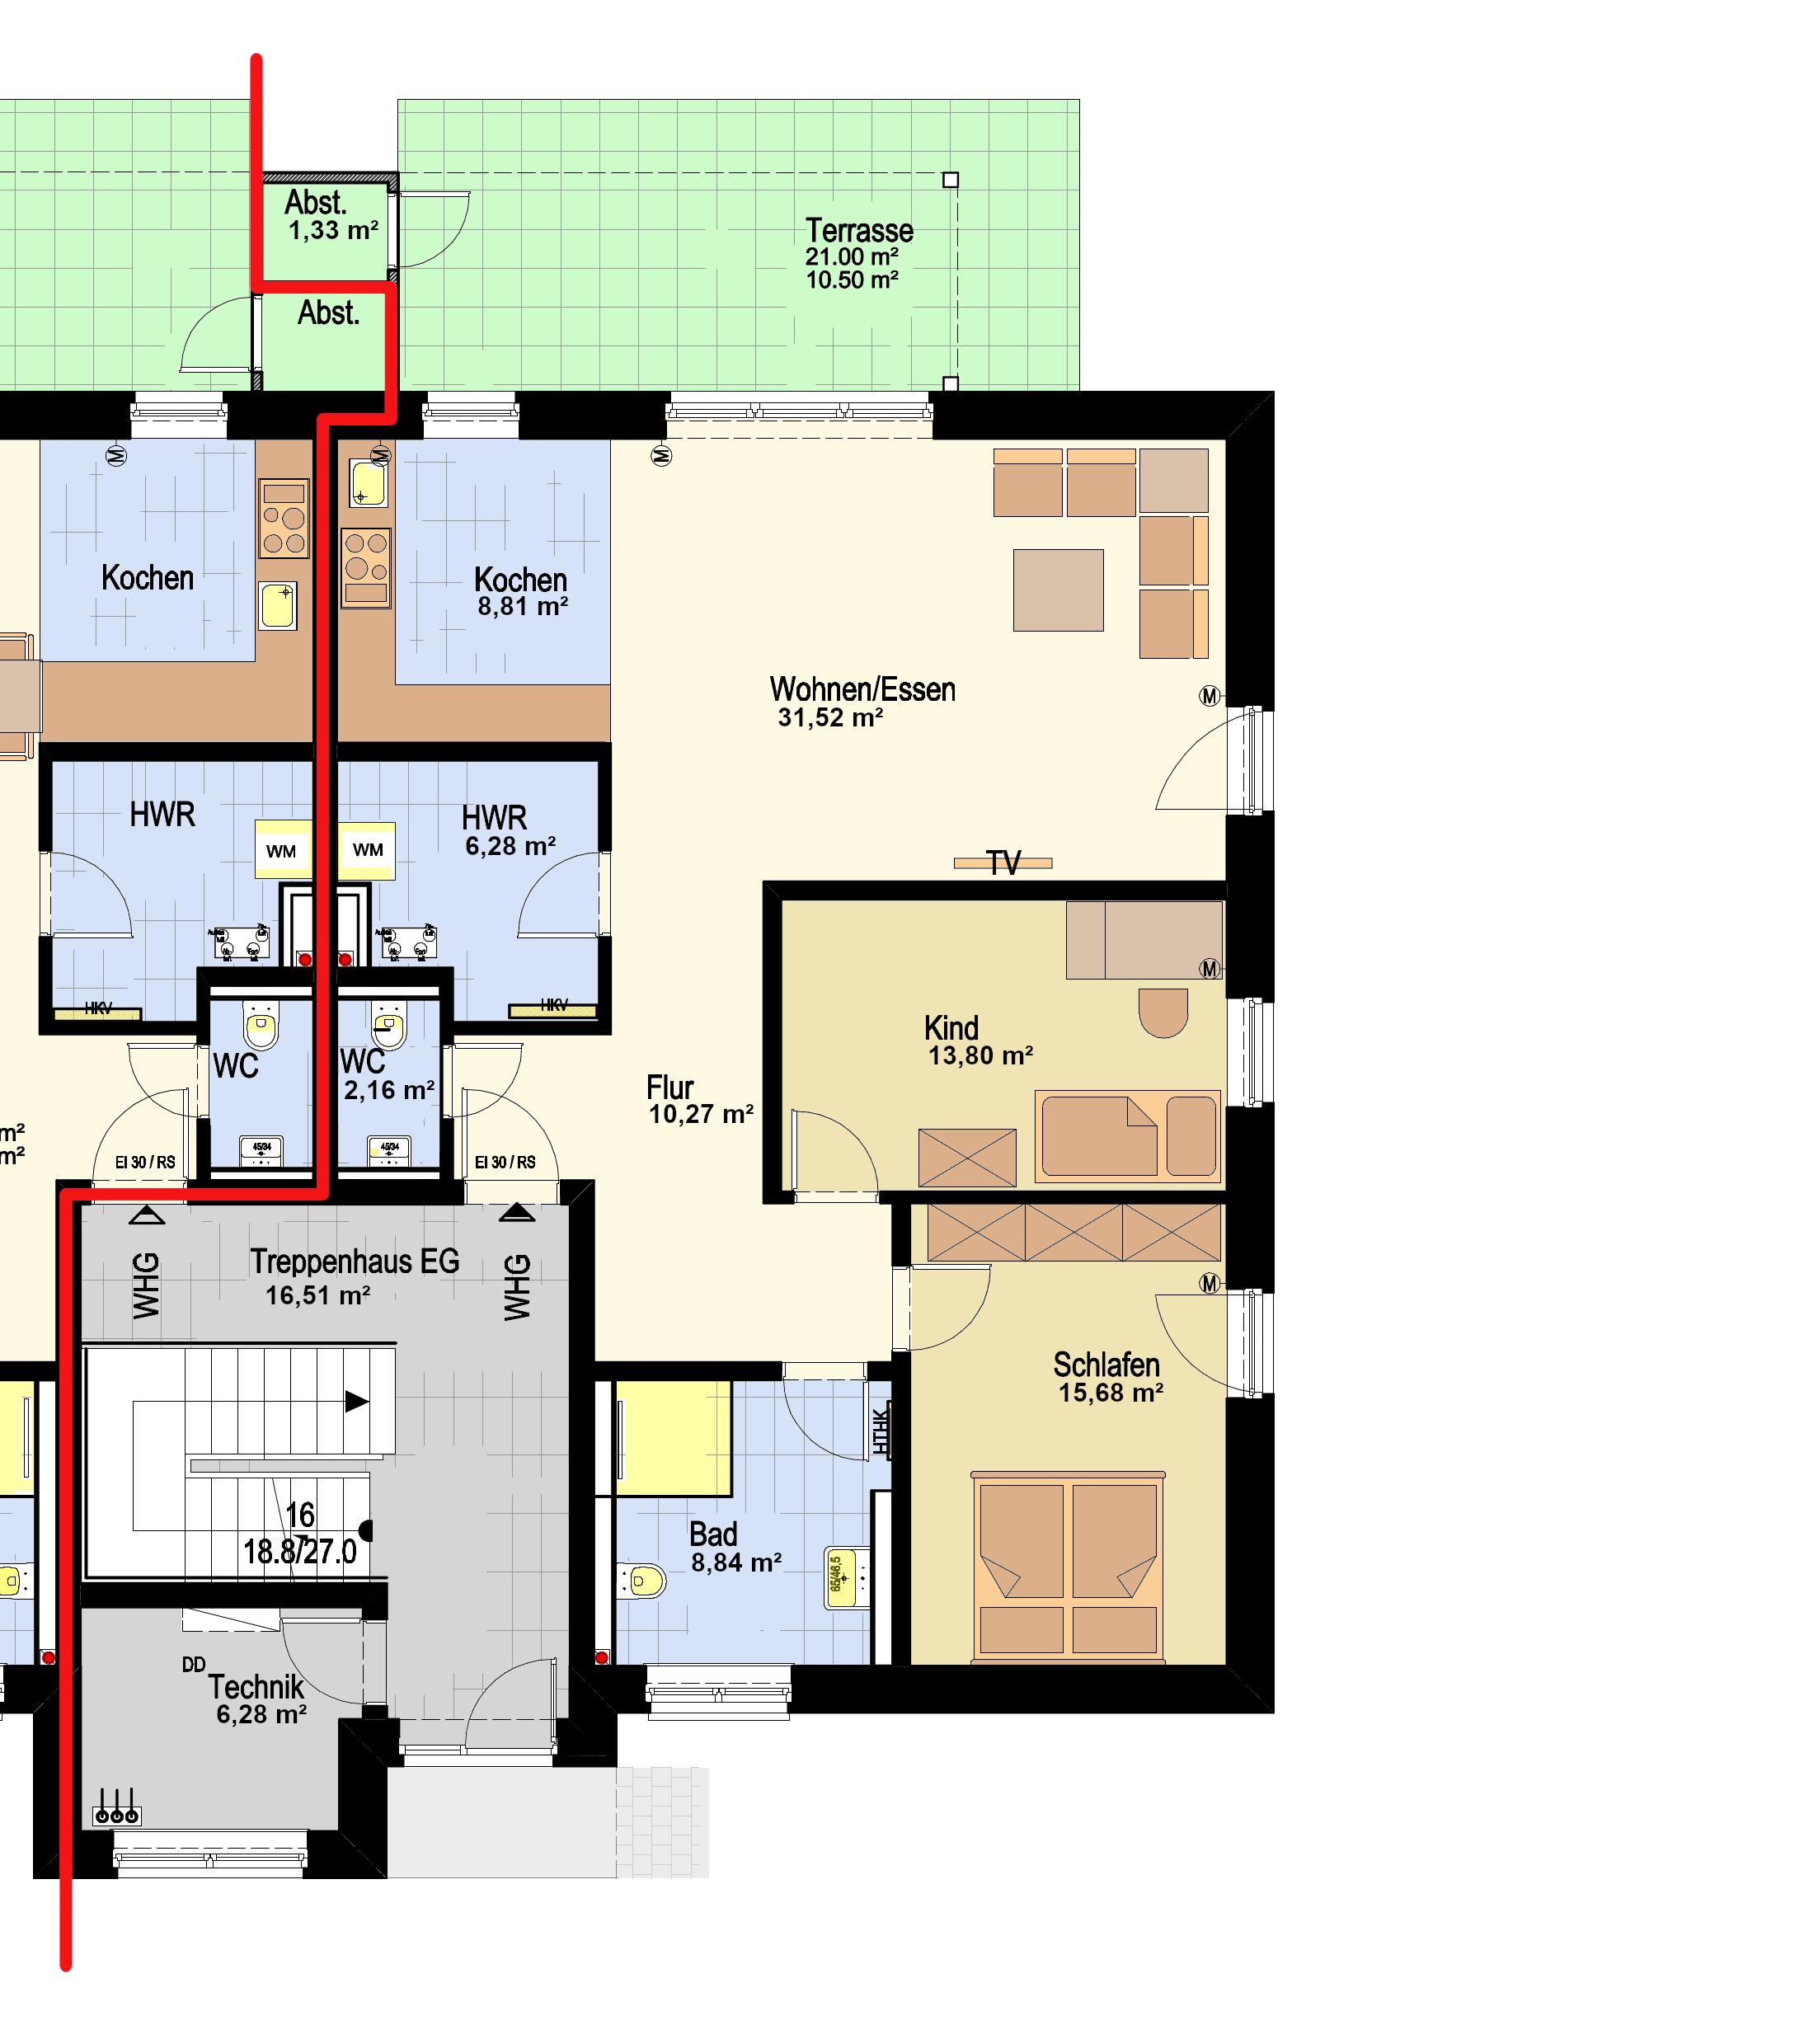 EG Haus 1 - WHG 1_Haus 2 - WHG 2